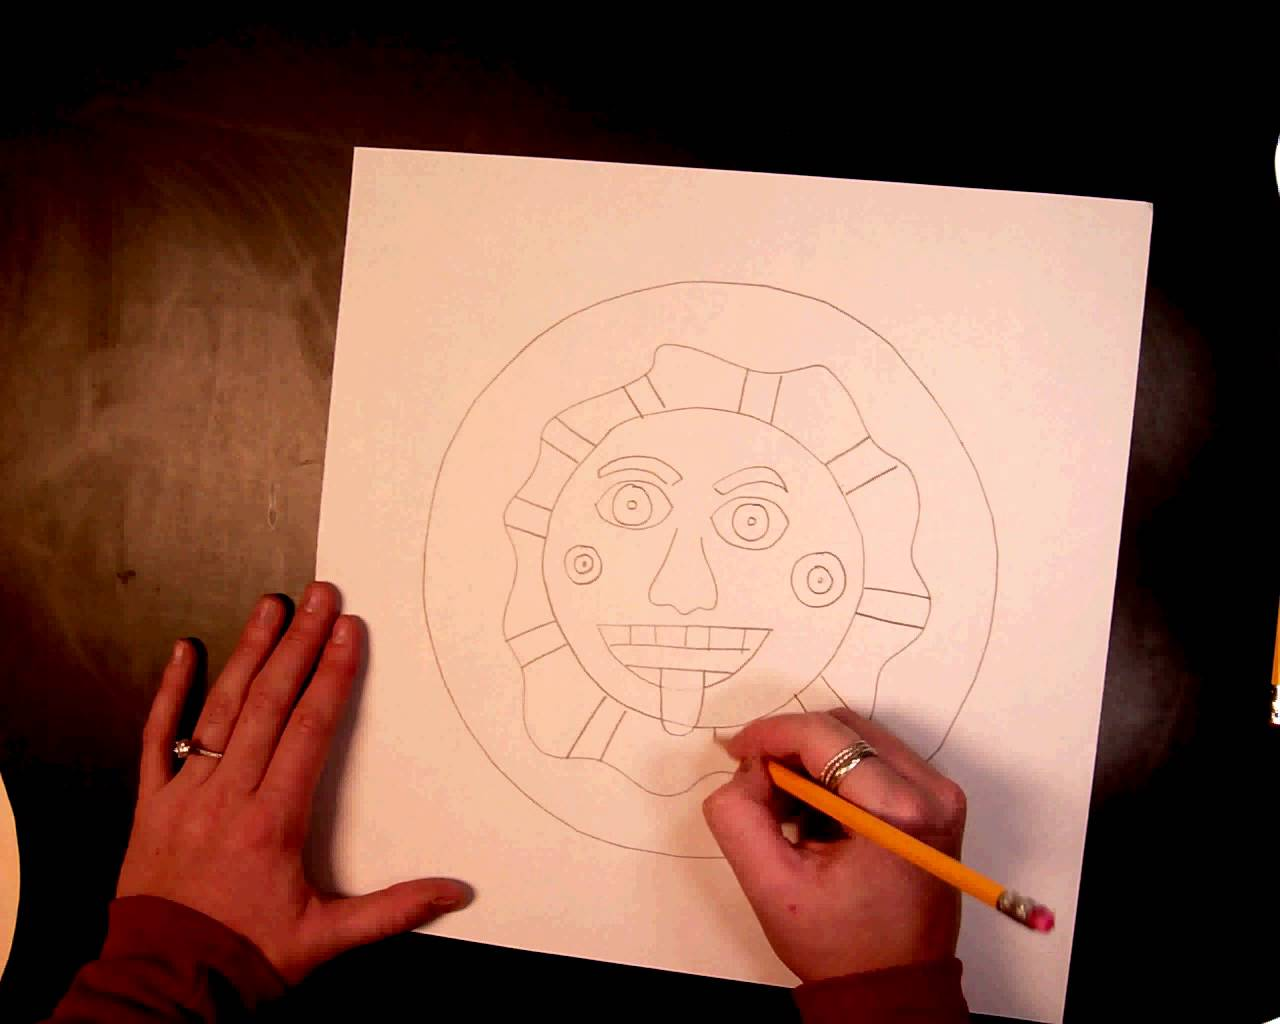 1280x1024 Aztec Sun Drawing (1 Of 4)